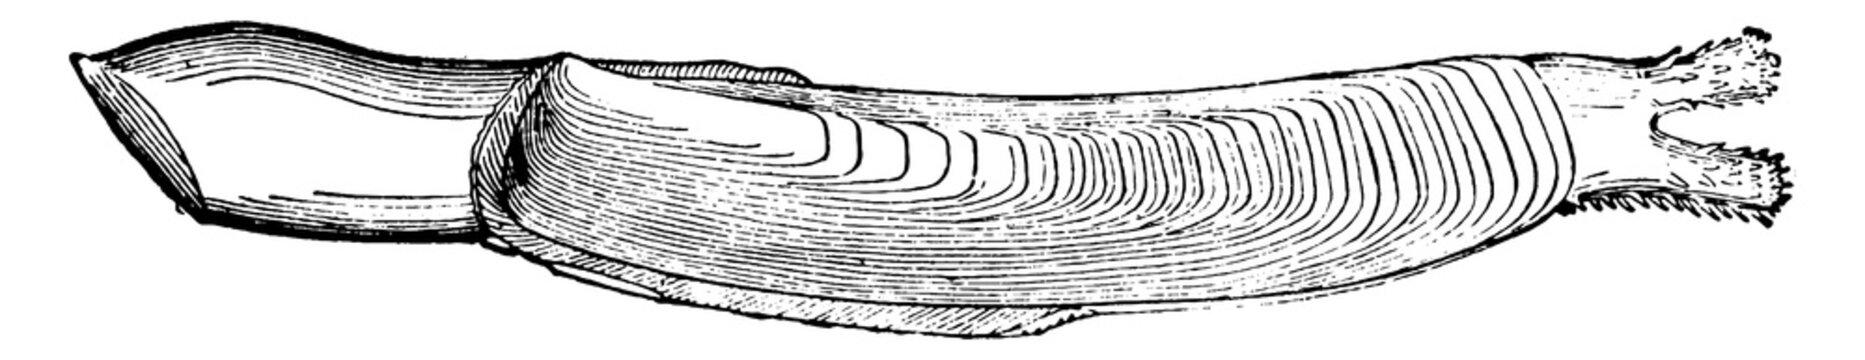 Razor Shell Clam, vintage illustration.